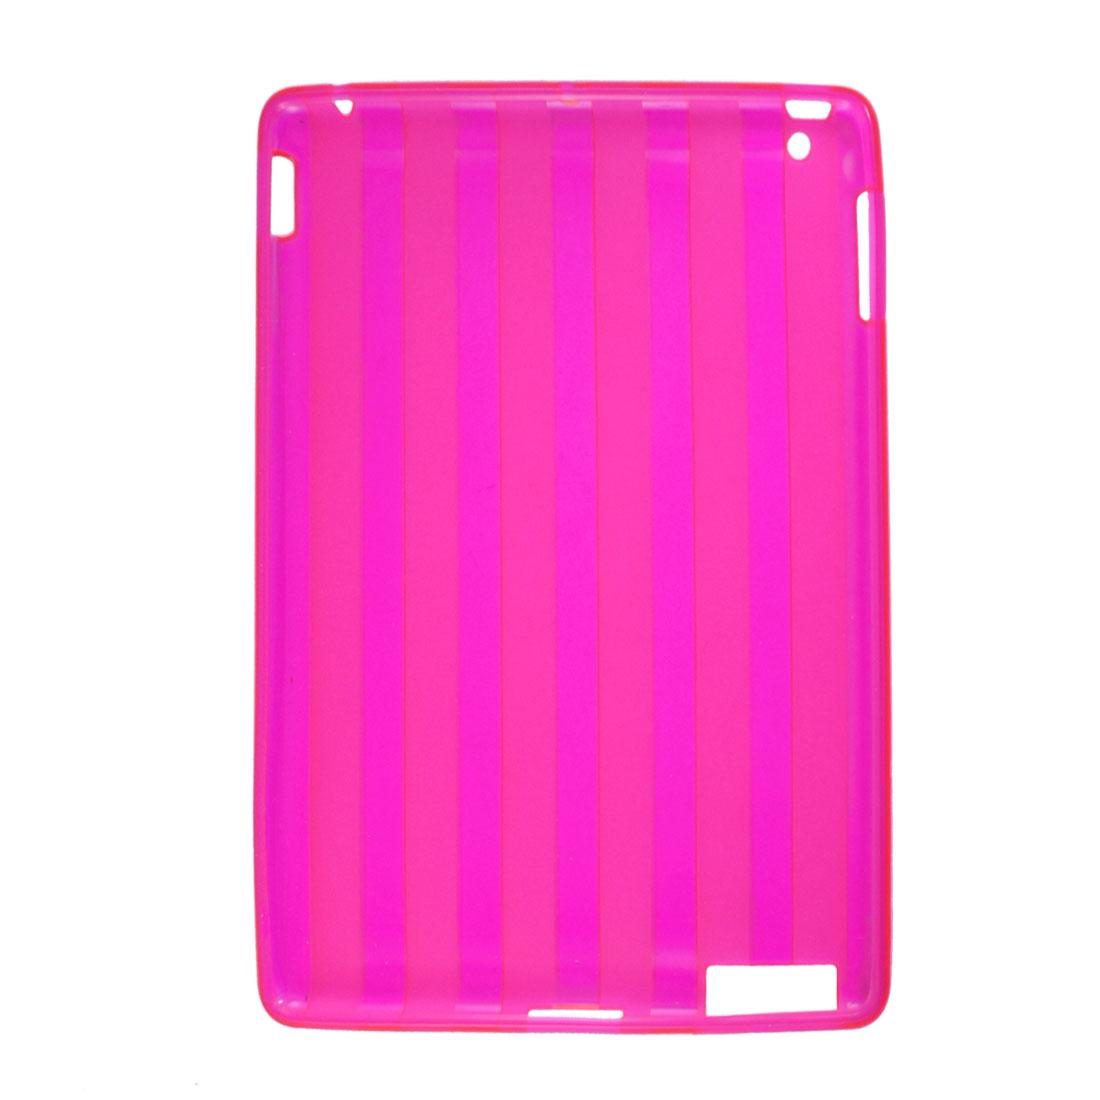 Fuchsia Amaranth Soft Plastic Vertical Stripe Protective Case for iPad 2 3